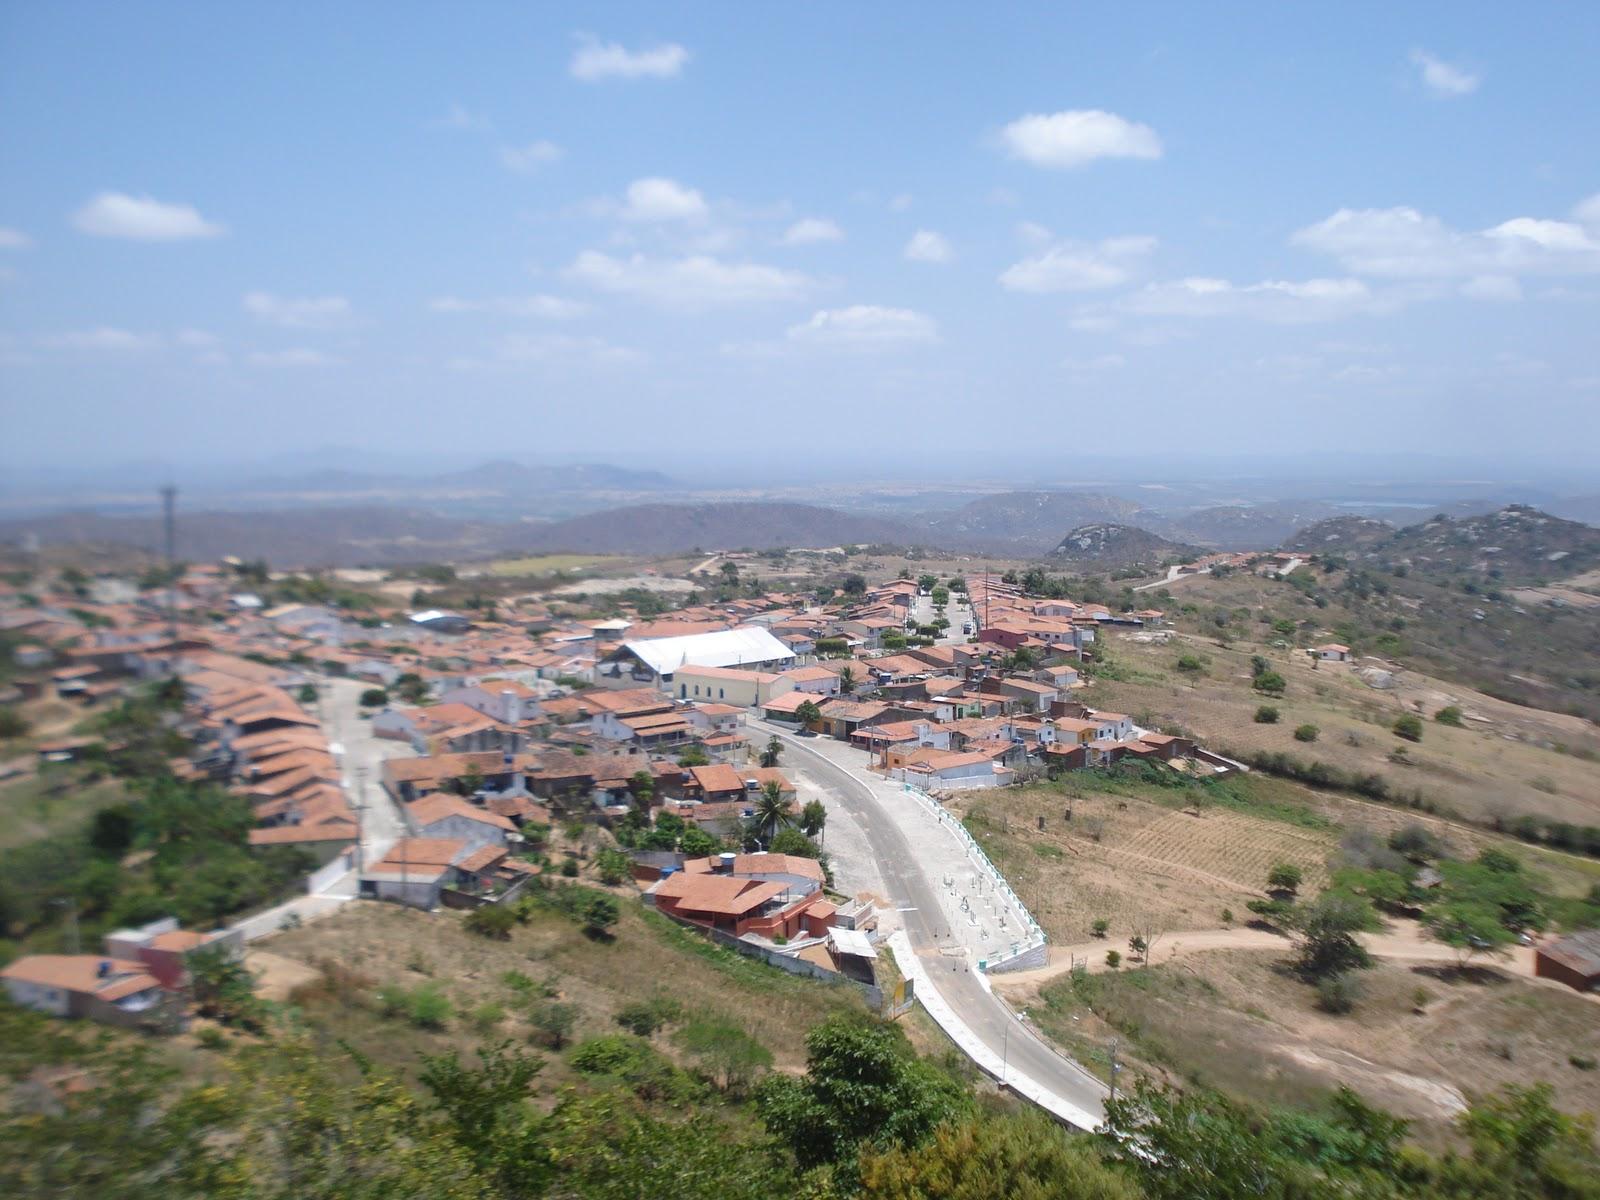 Monte das Gameleiras Rio Grande do Norte fonte: 3.bp.blogspot.com